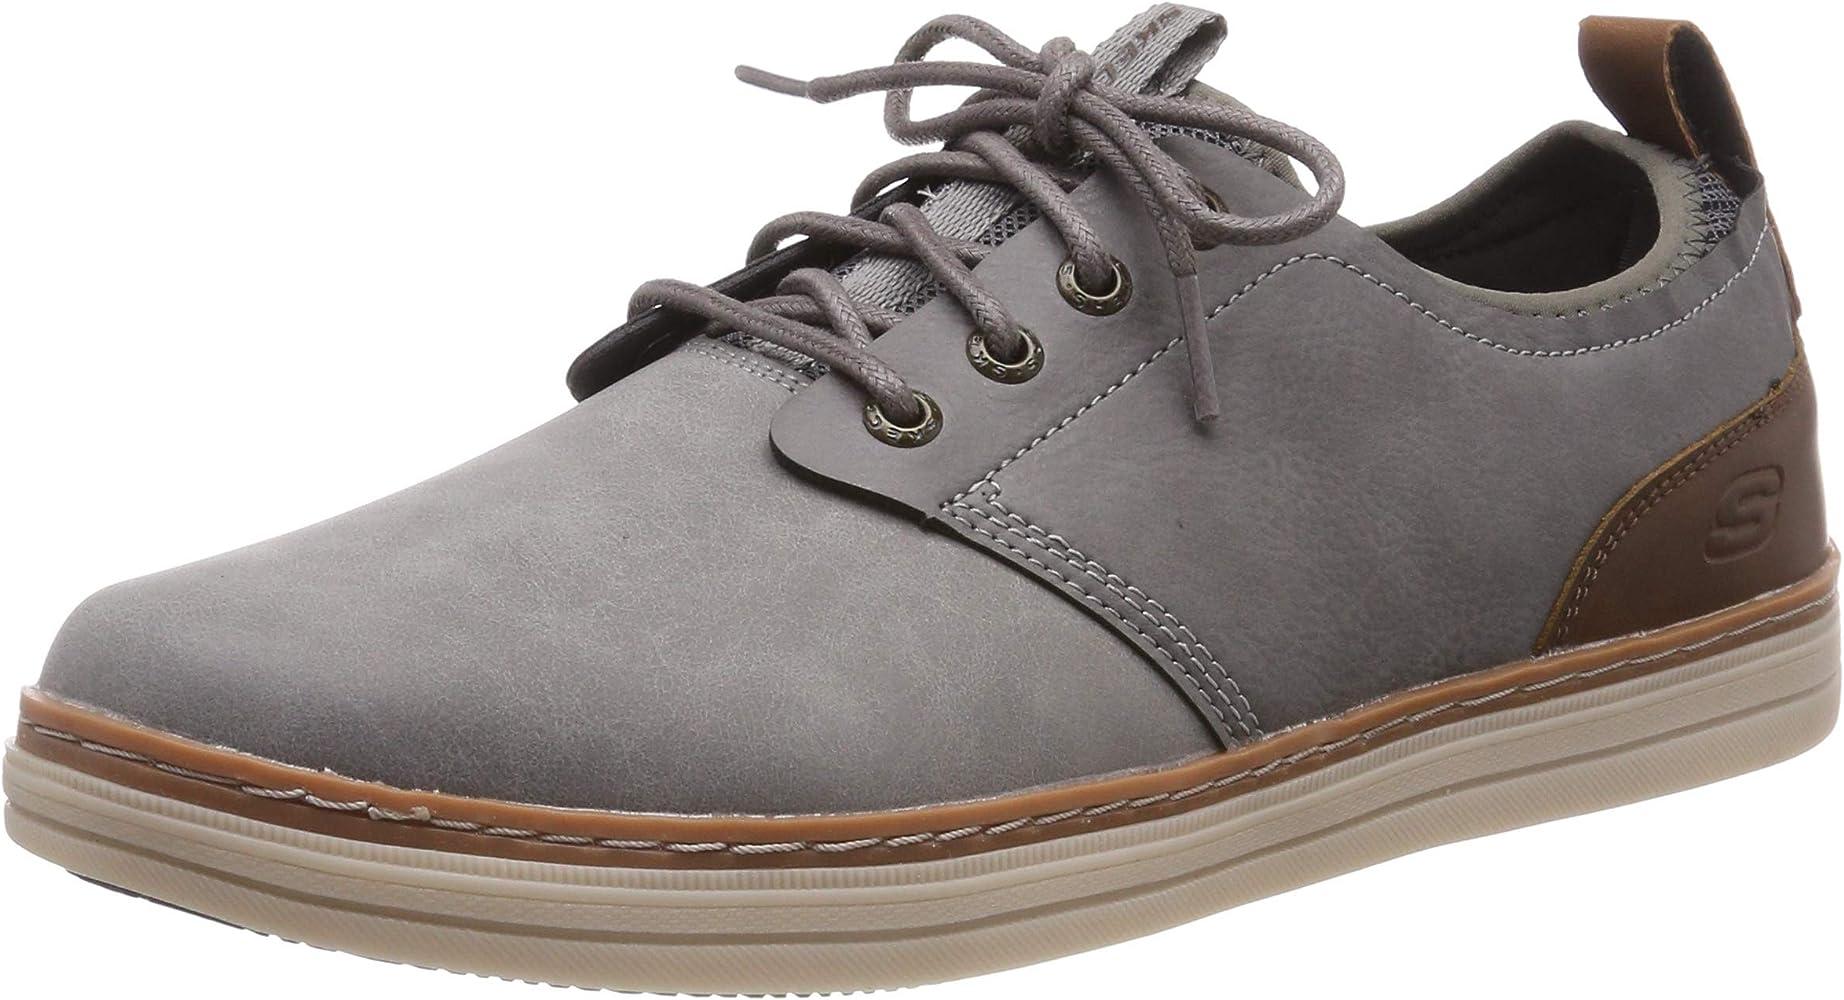 Inhibir Moretón Antídoto  Amazon.com   Skechers Men's Heston-ROGIC Oxford, Grey, 7.5 Medium US   Shoes